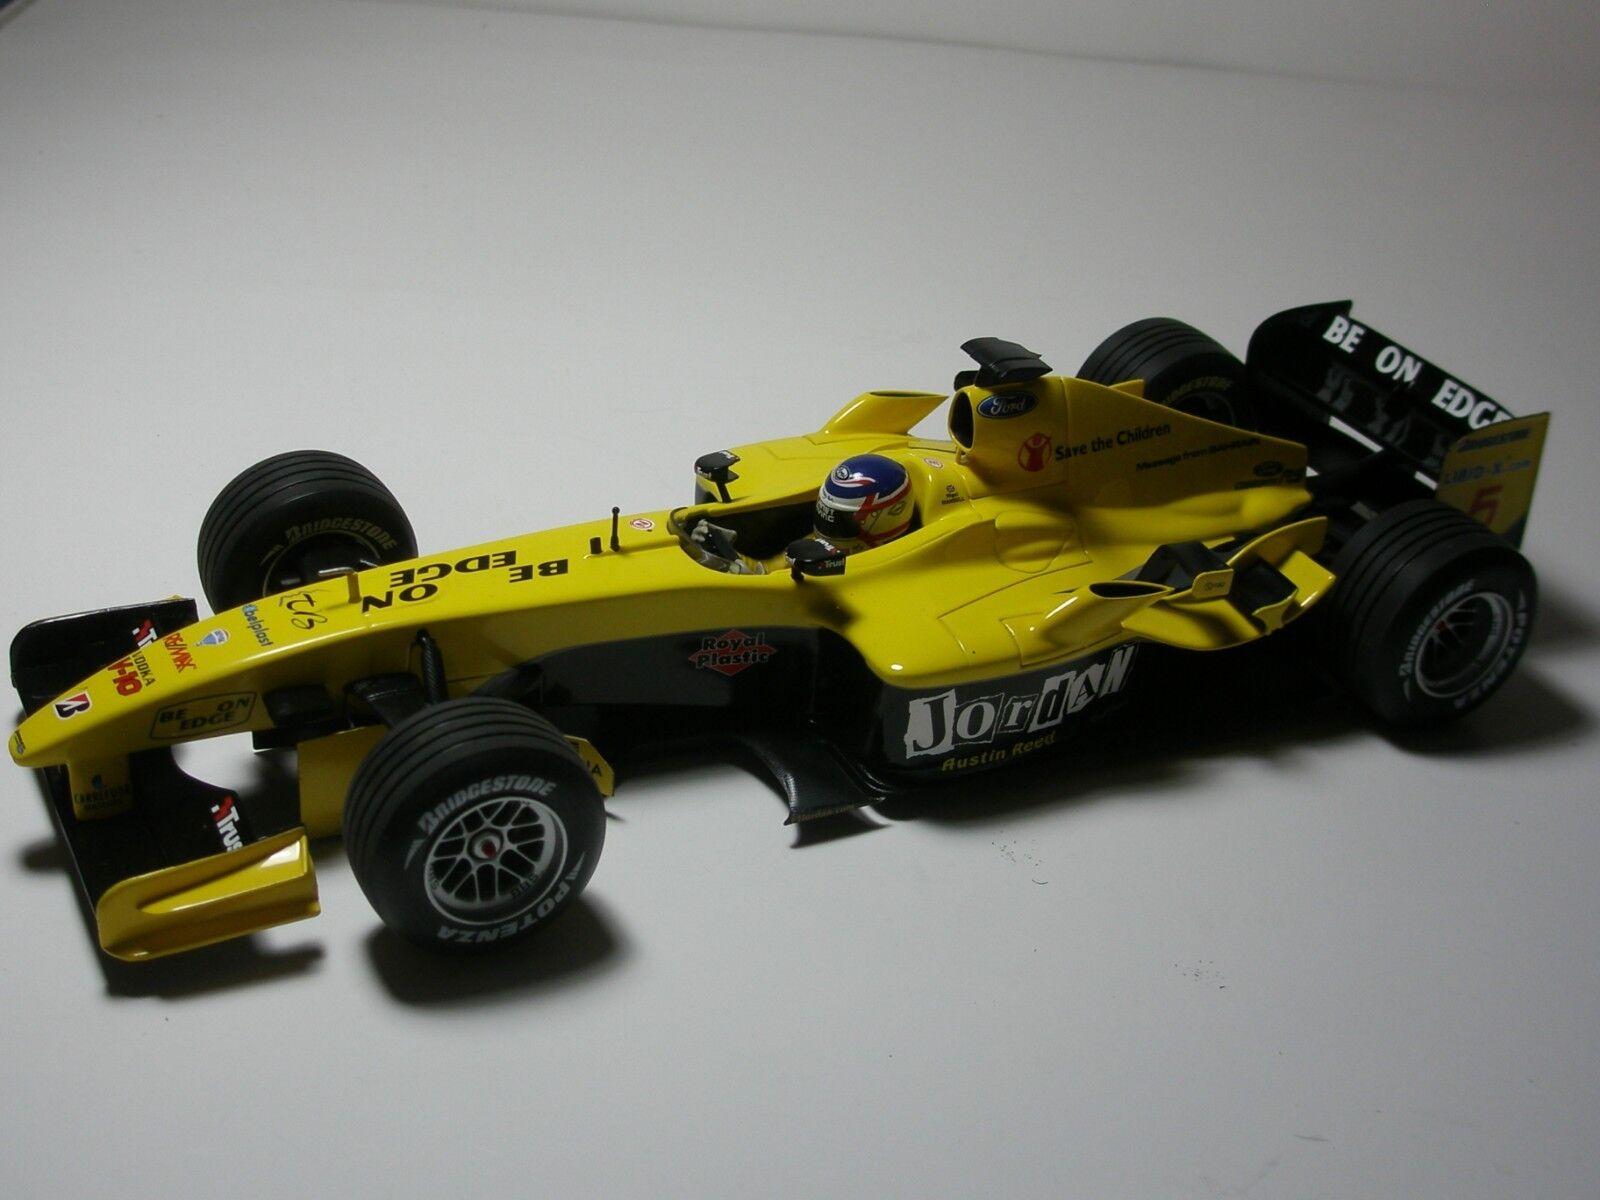 1 18 F1 JORDAN 2004 - NIGEL MANSEL